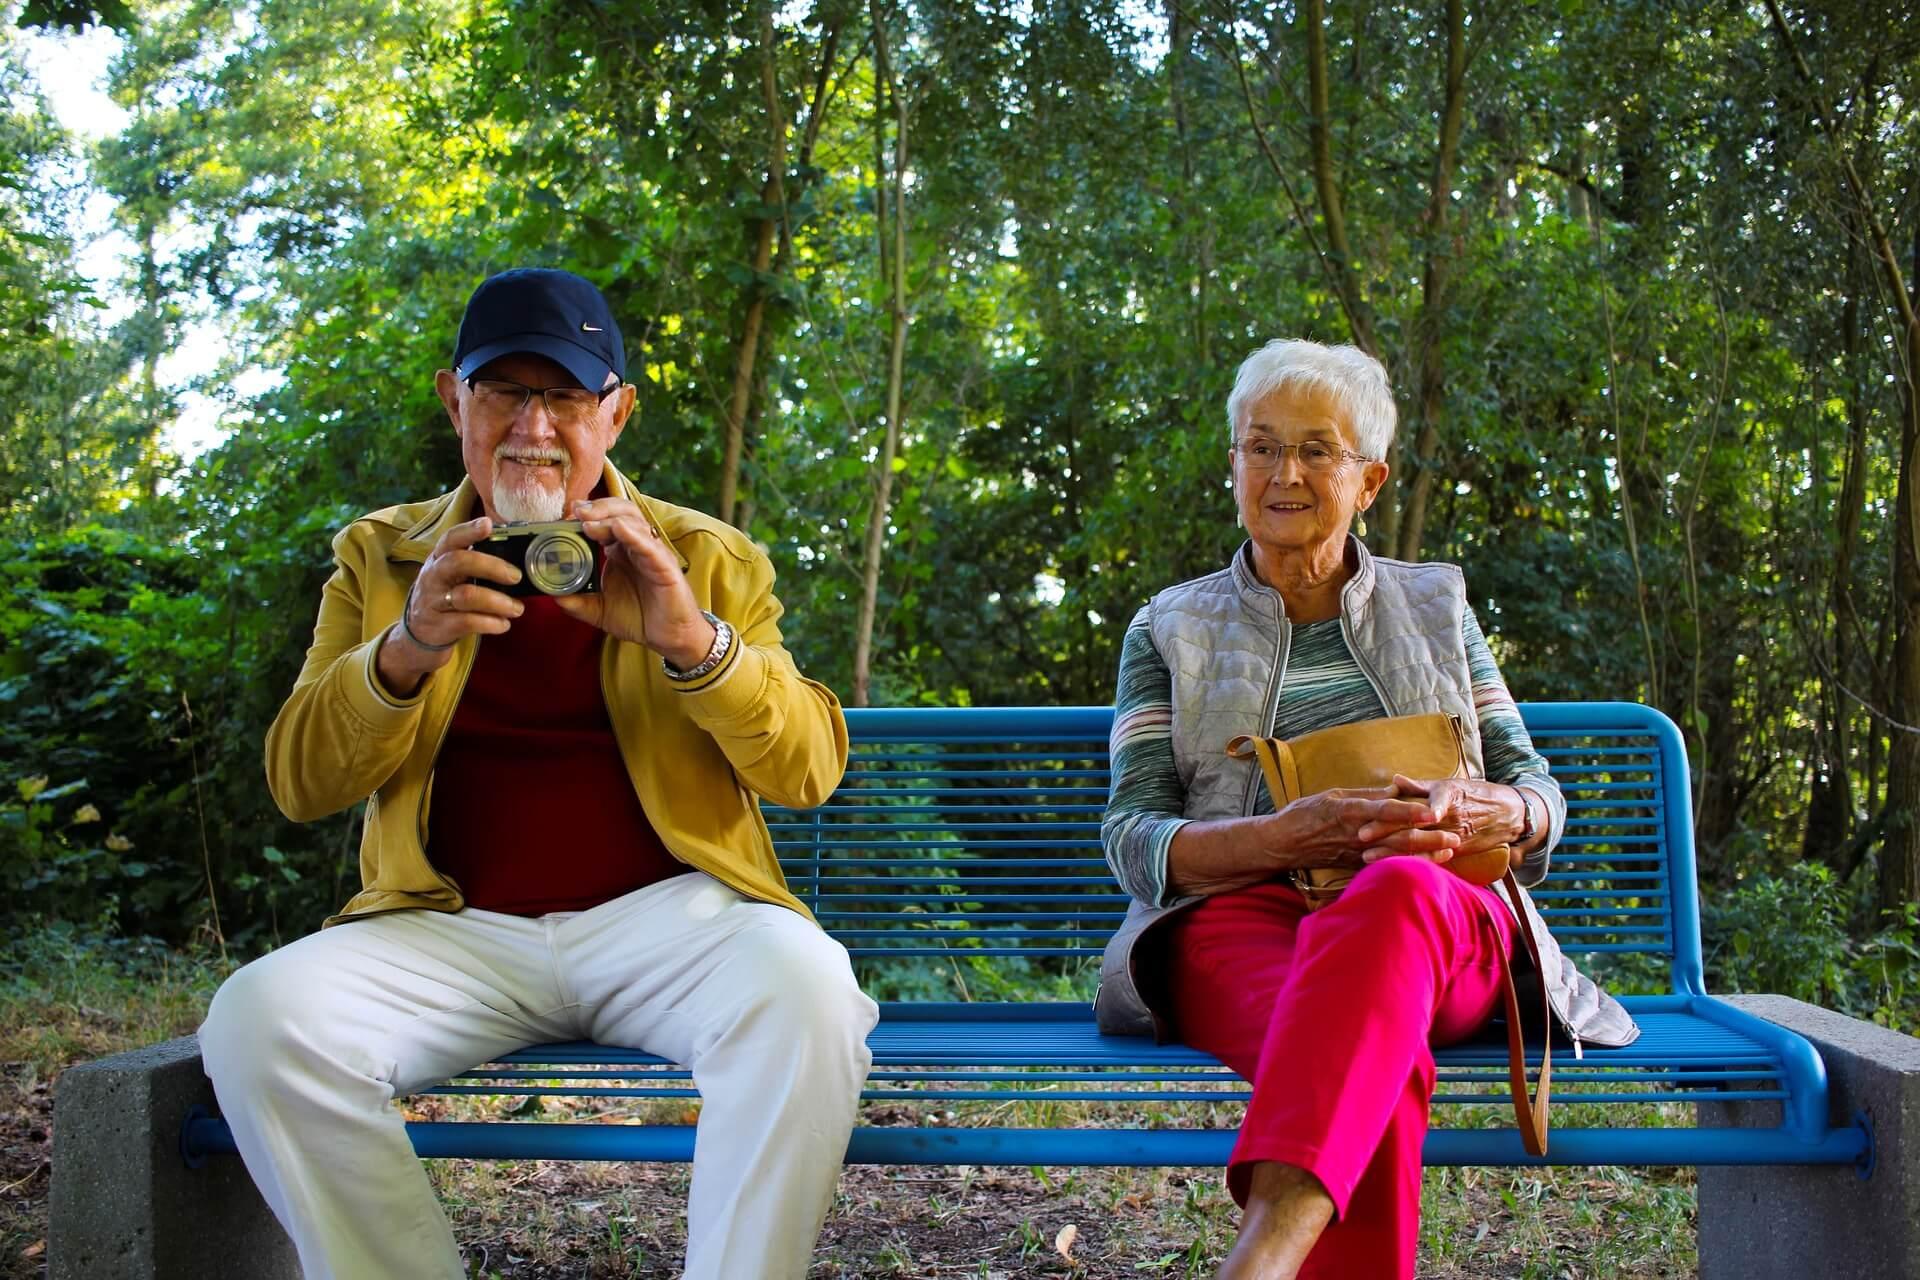 Boomeri pod napadom: Facebook pun grupa u kojima Milennialsi objavljuju u boomerskom stilu